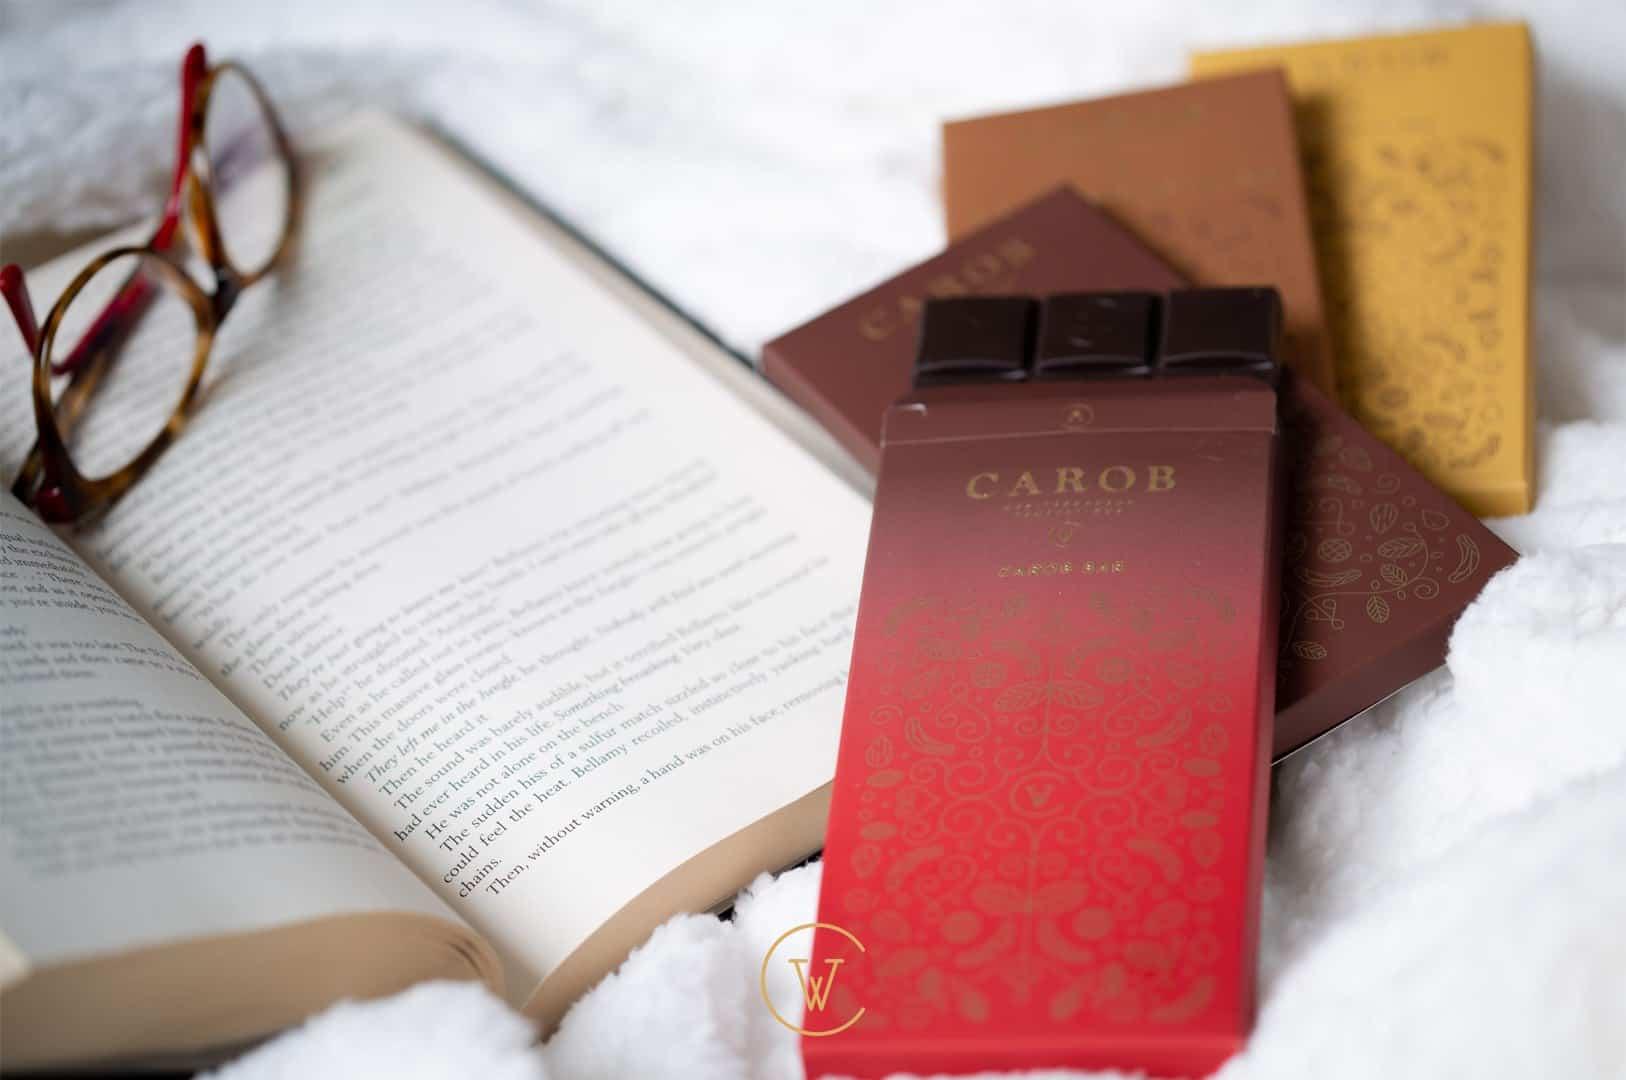 carob3